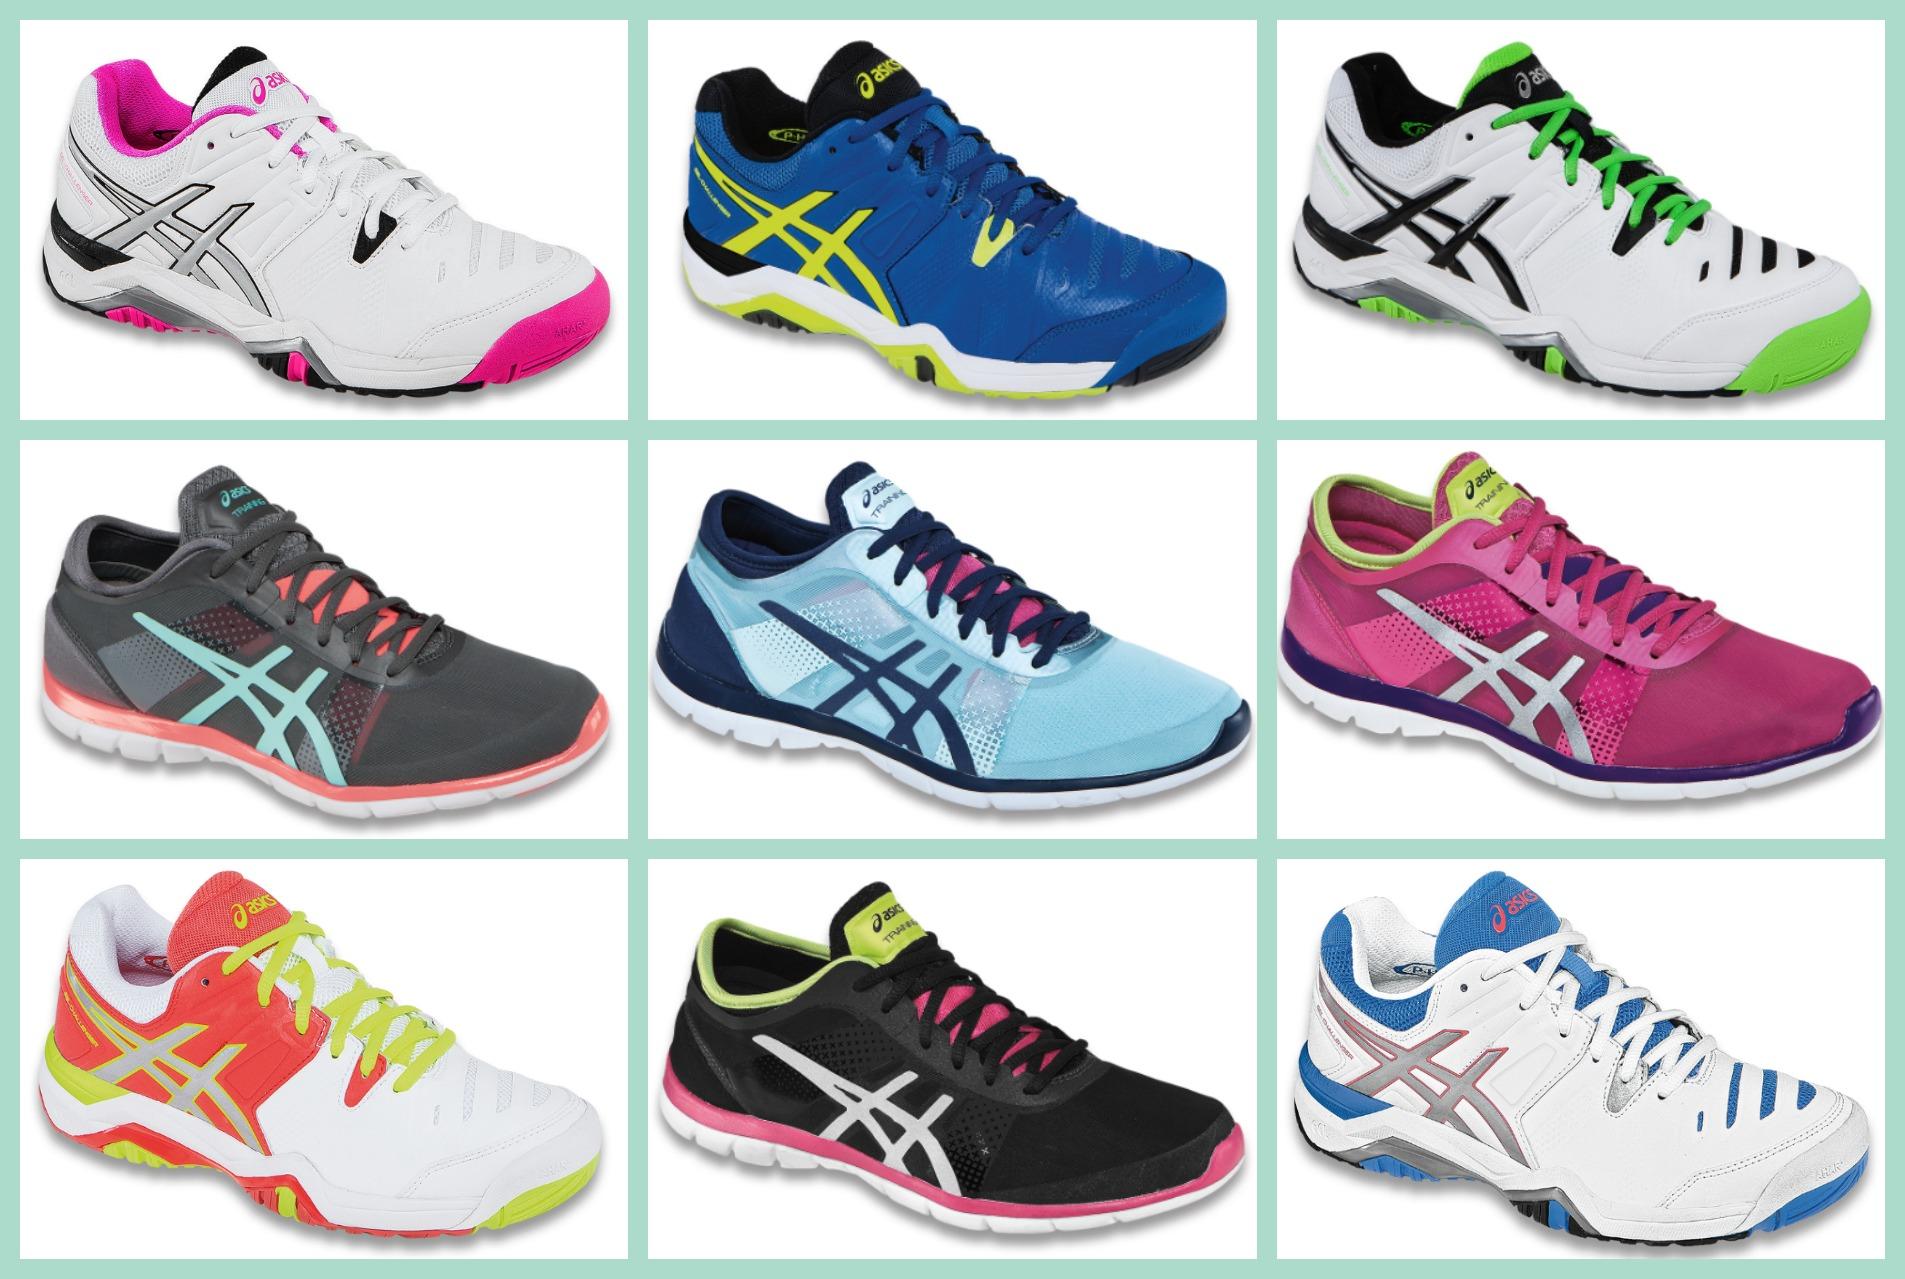 Black Friday Asics Tennis Shoes Deals